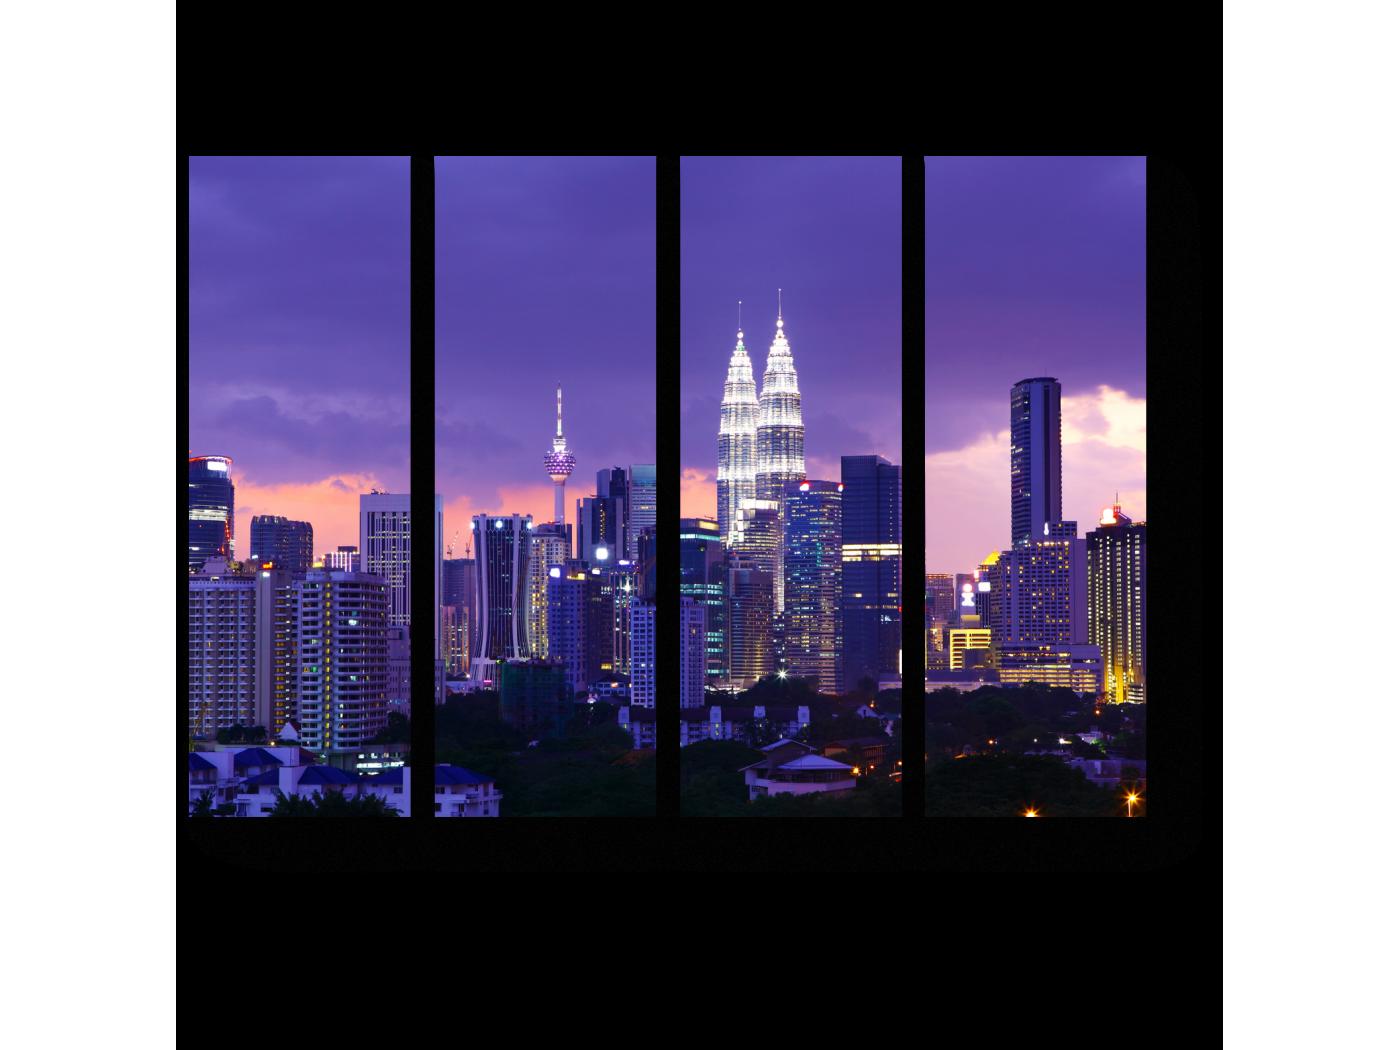 Модульная картина Сияющий в ночи Куала-Лумпур (60x45) фото